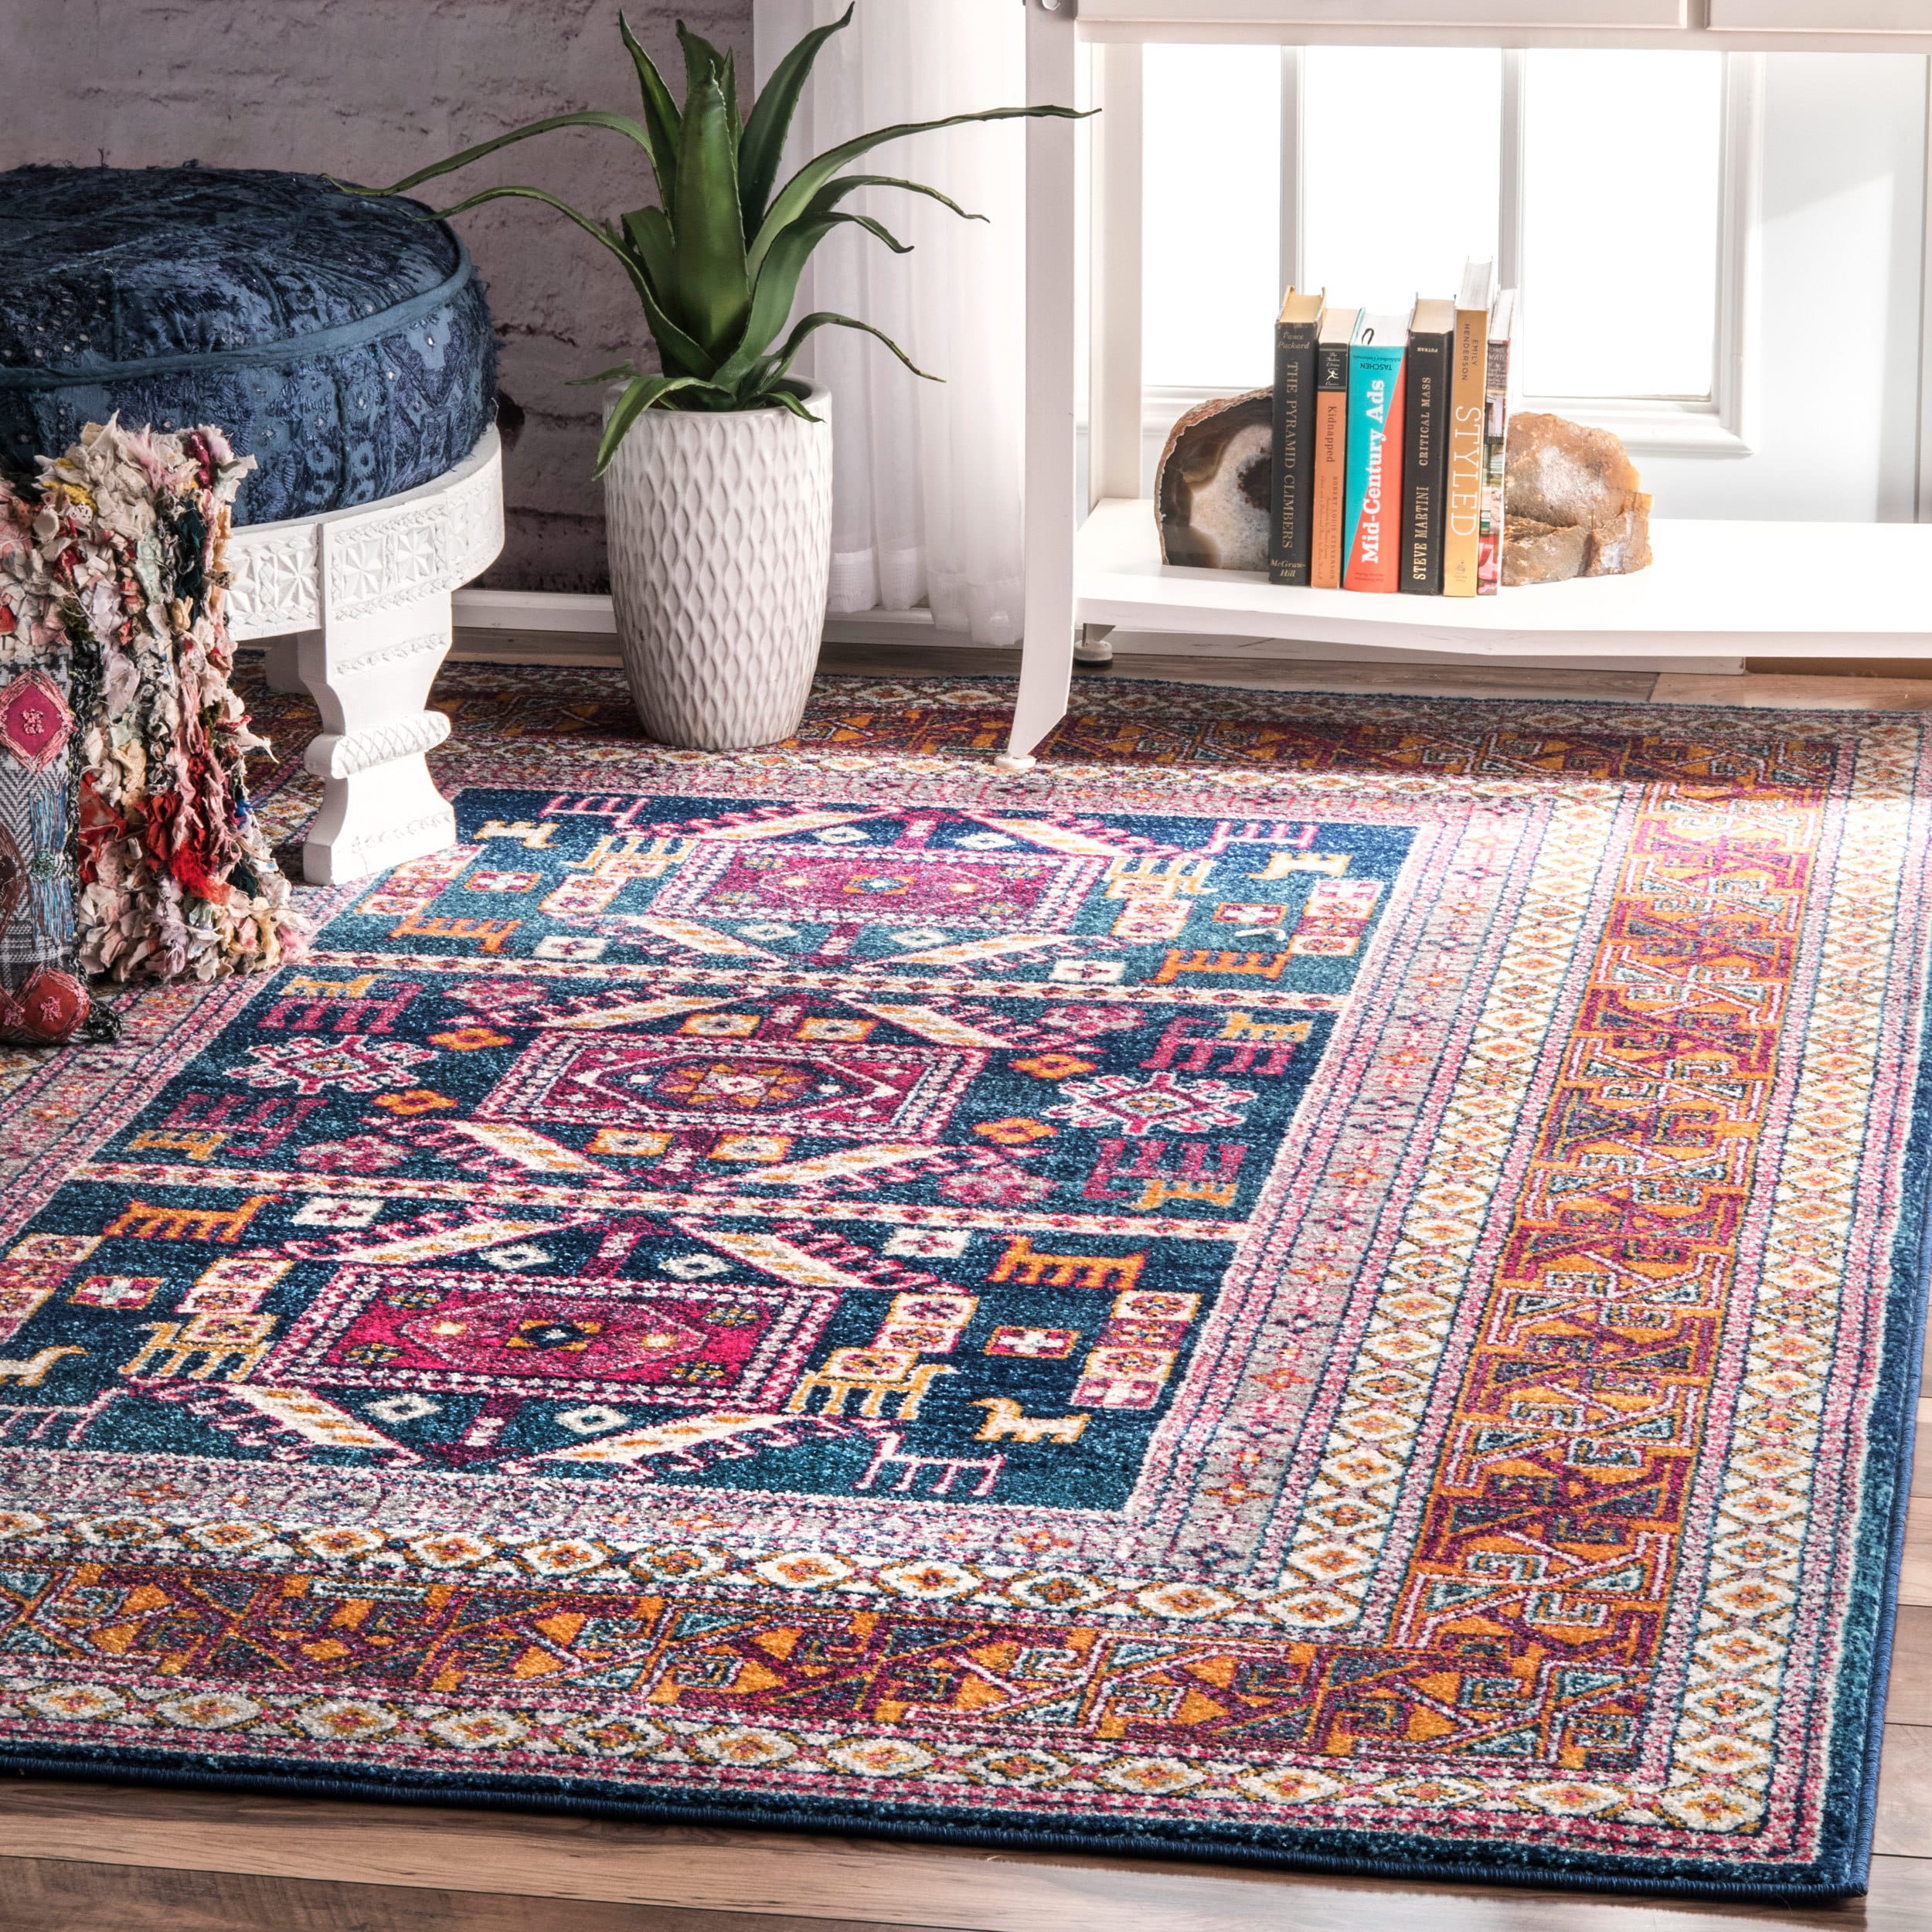 rug wool accessories rugs bohemian natural zoom home